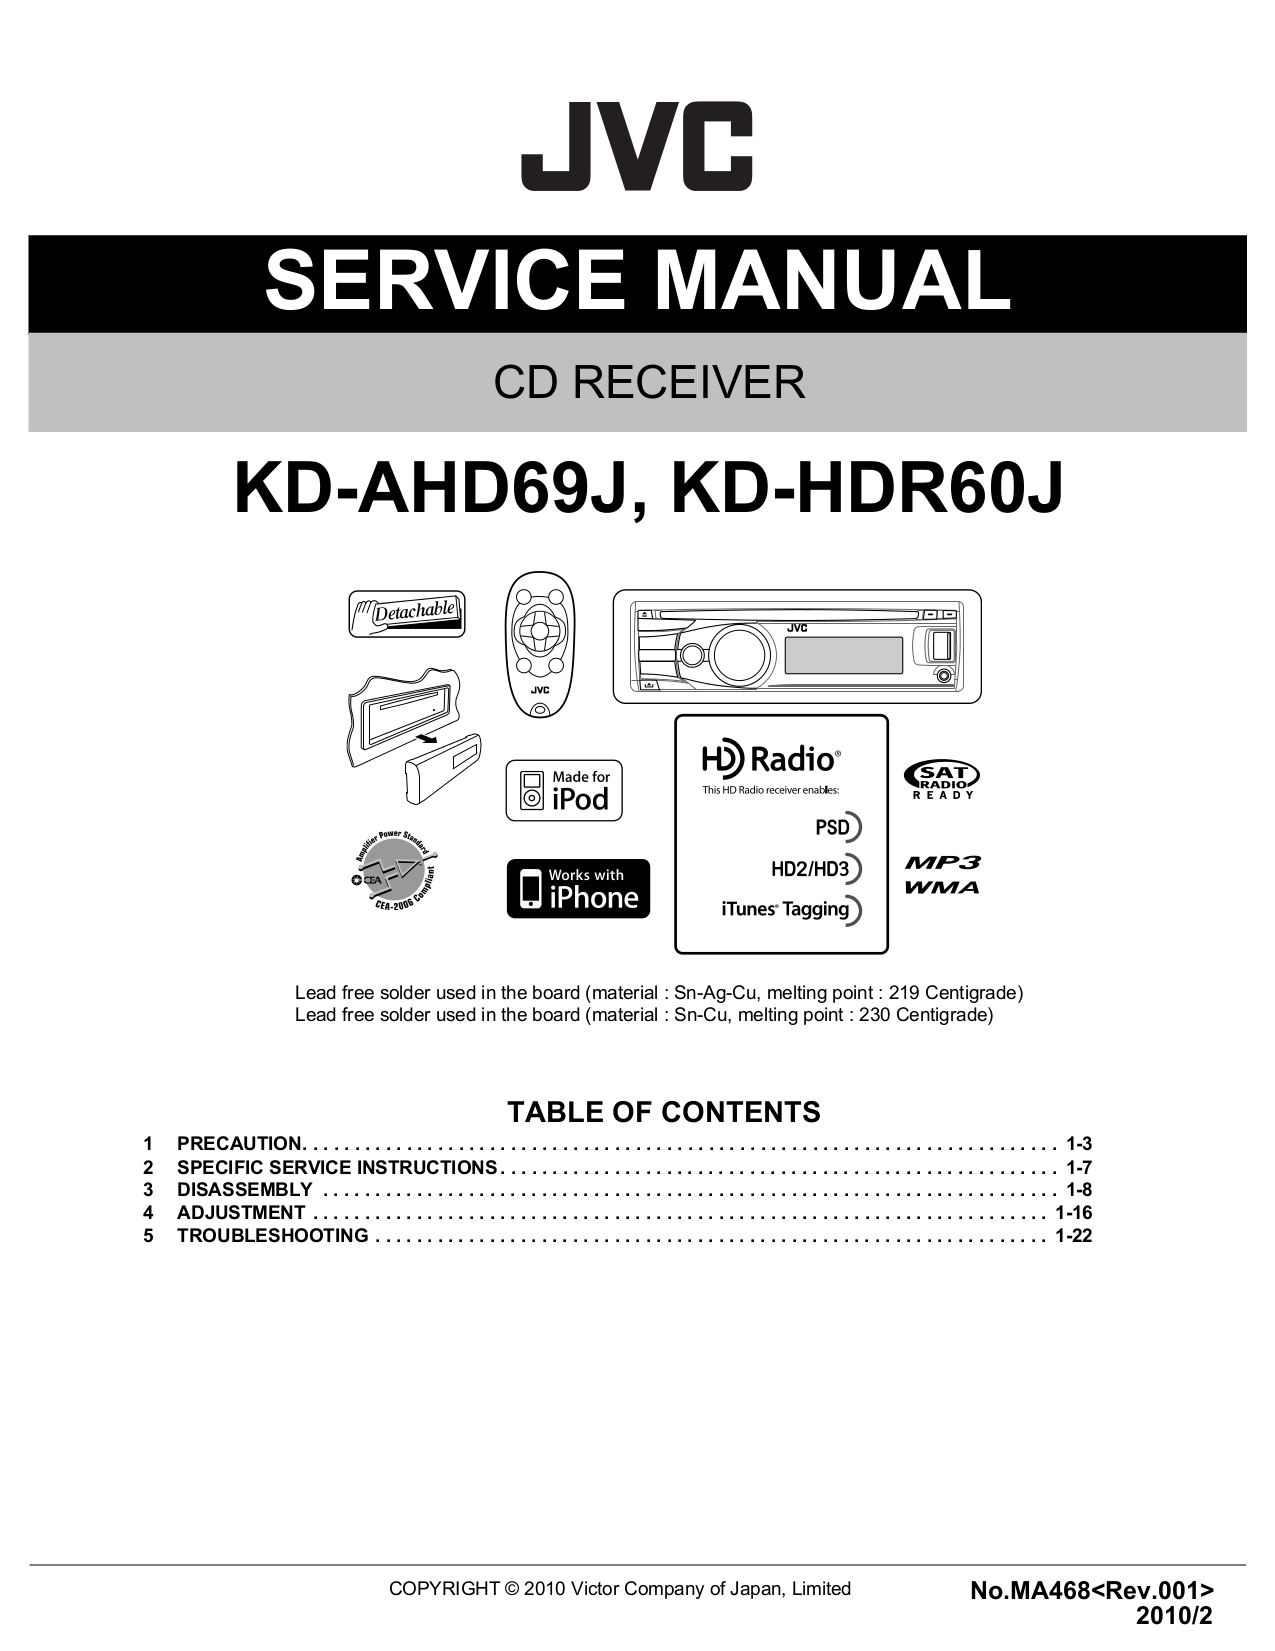 download free pdf for jvc kd s51 car receiver manual rh umlib com JVC Schematics JVC Home Audio